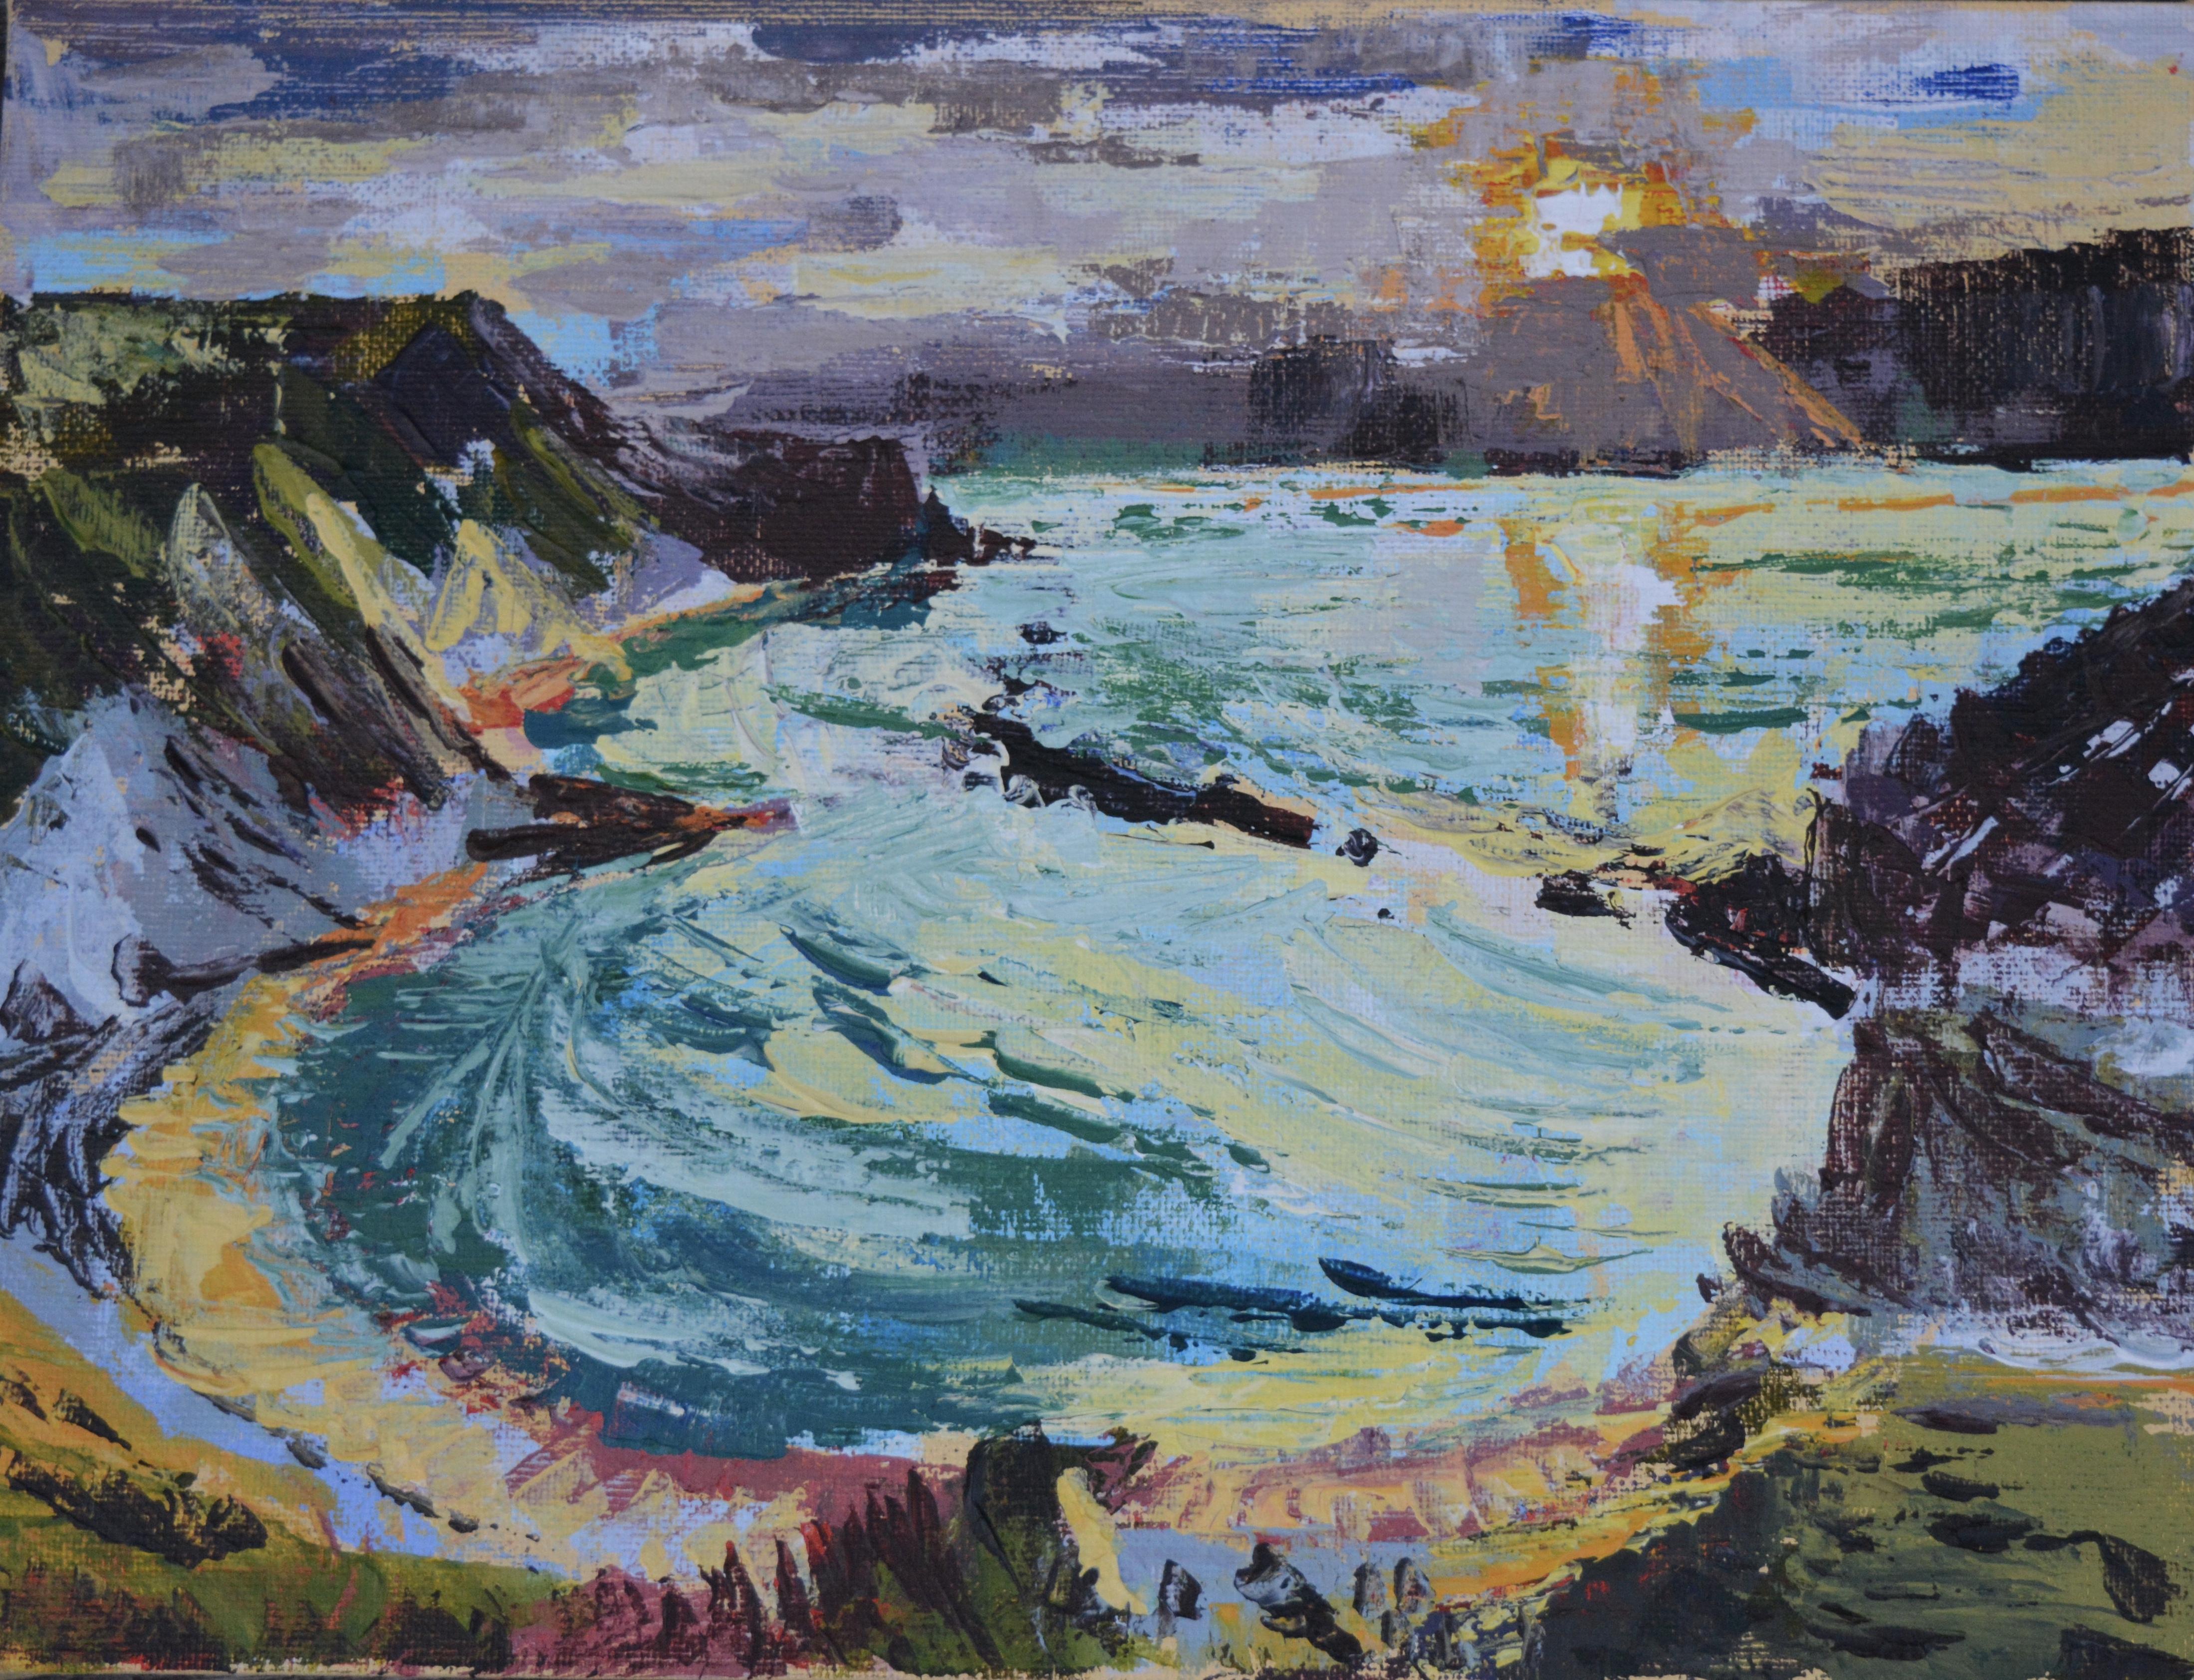 Man of War Bay, Acrylic on Canvas, 30.5 x 23cm